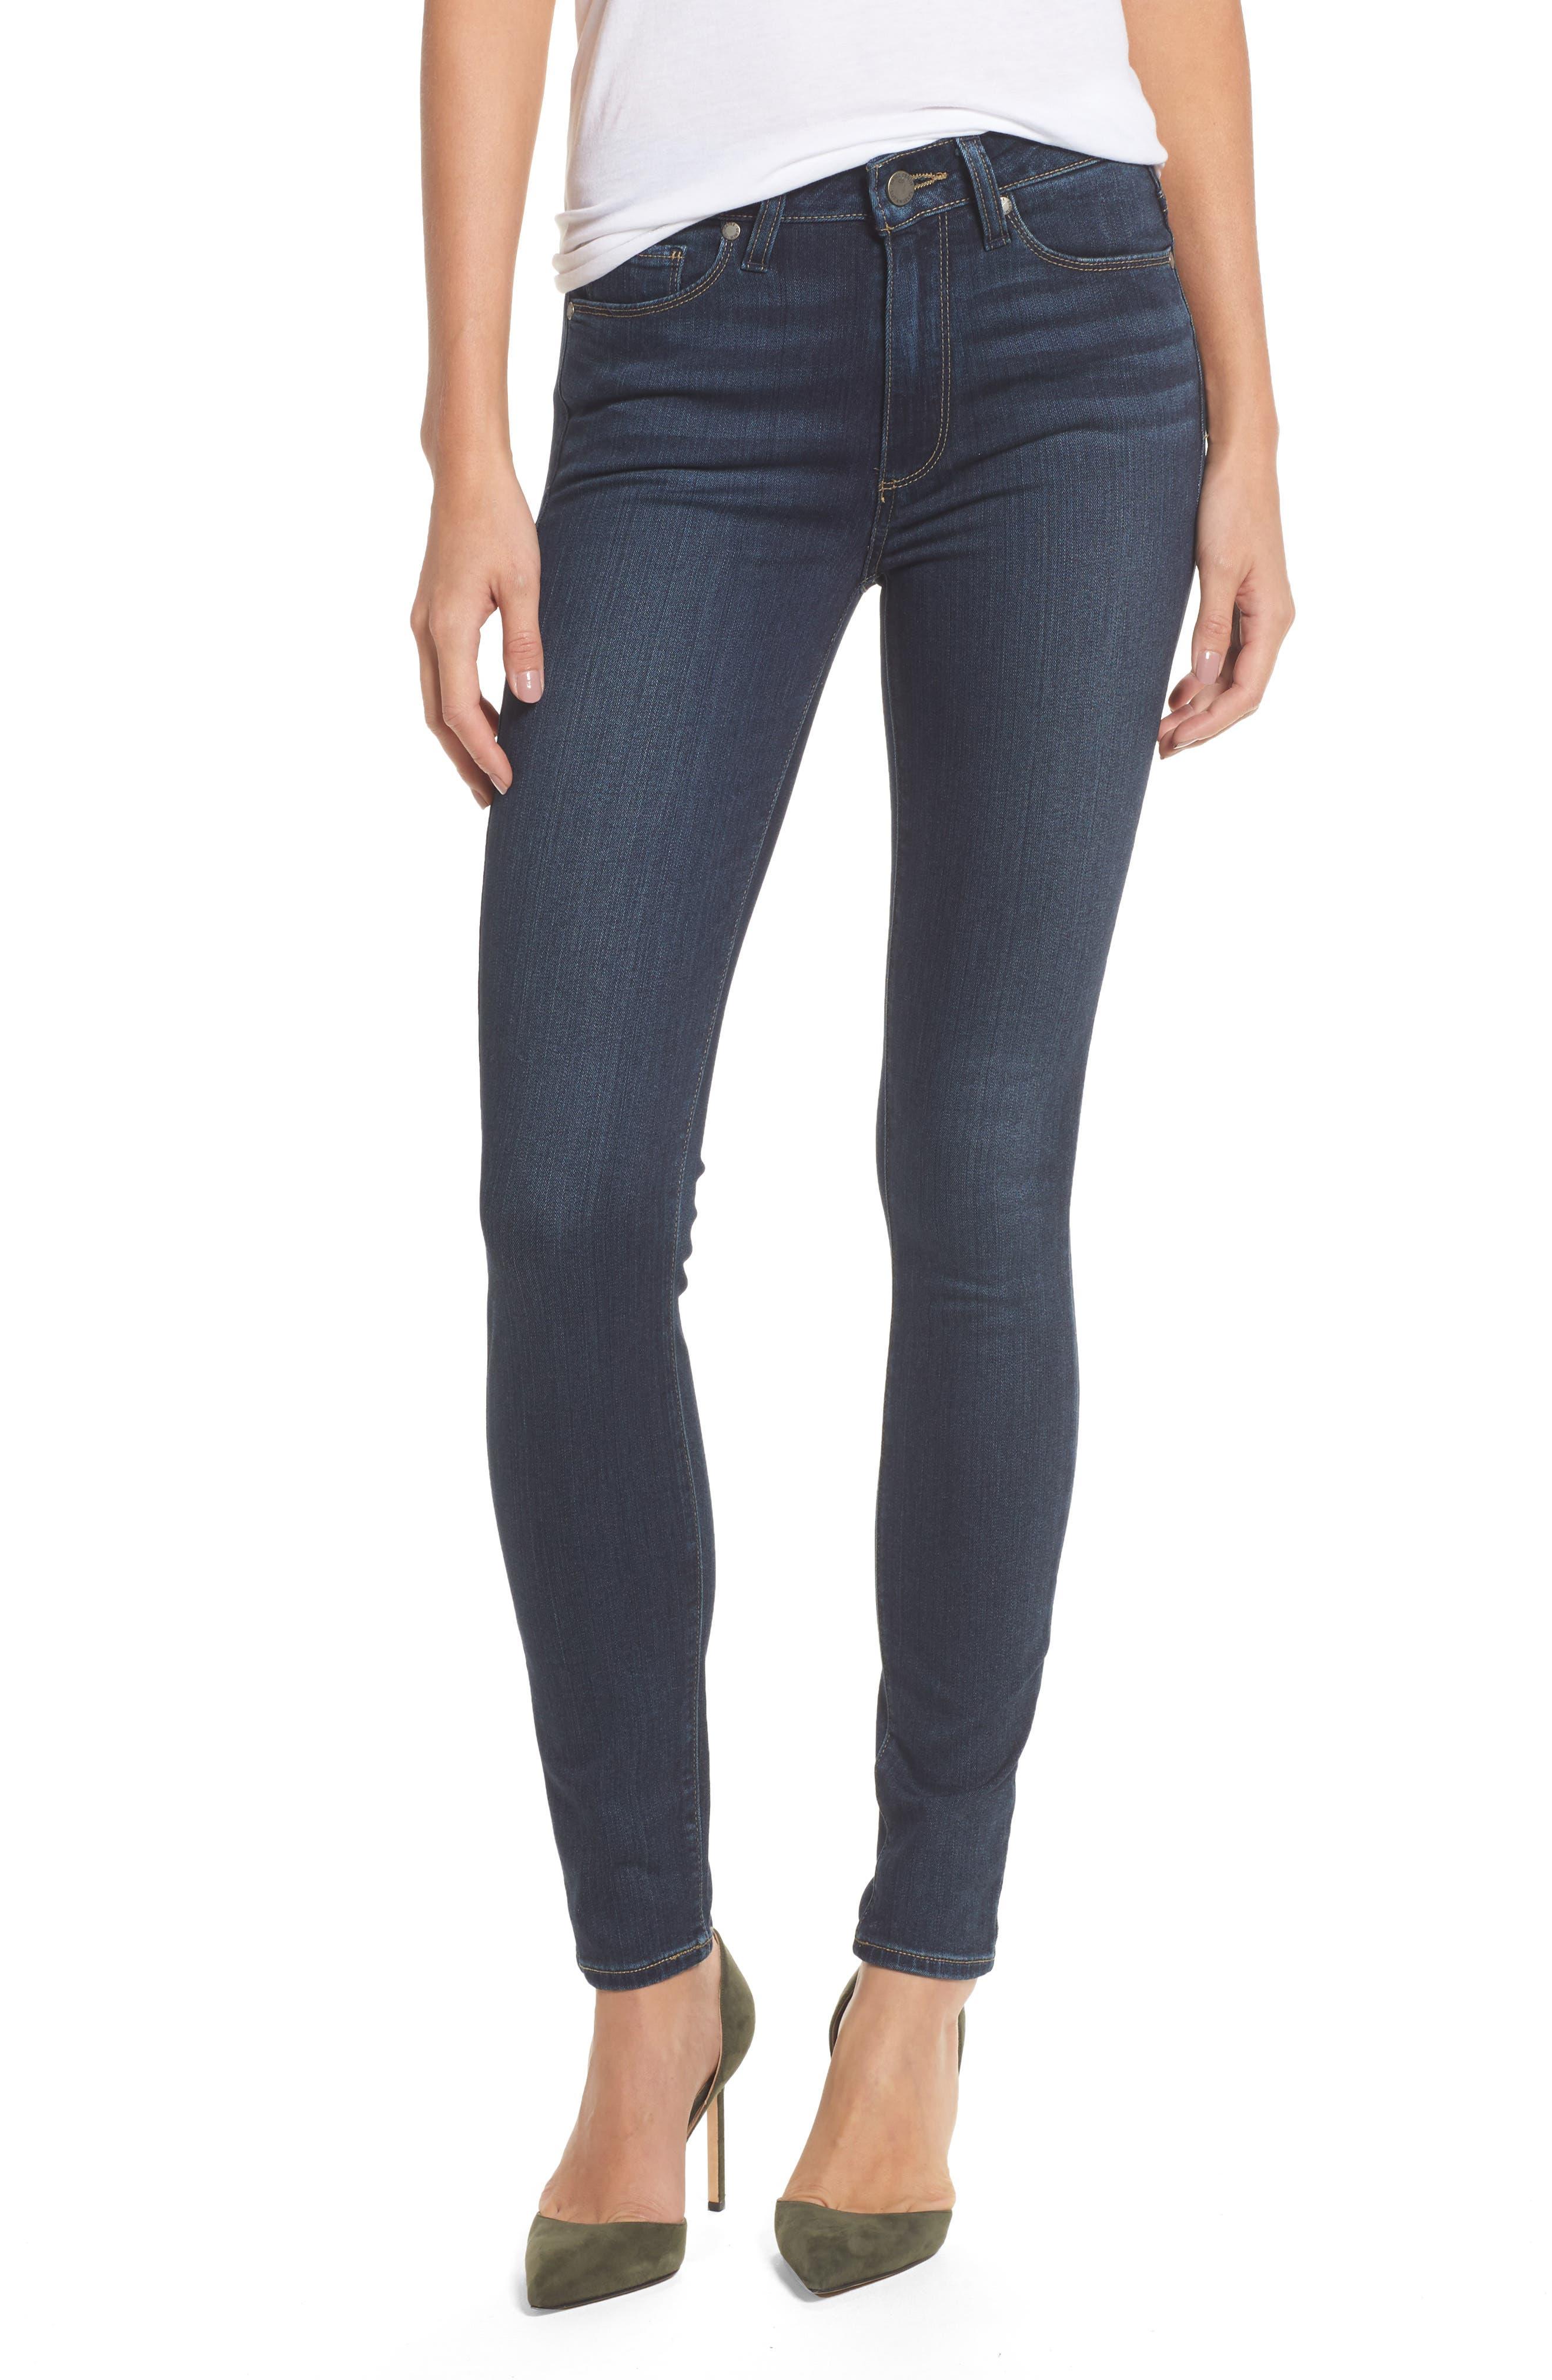 Transcend - Hoxton High Waist Ultra Skinny Jeans,                         Main,                         color, Nottingham